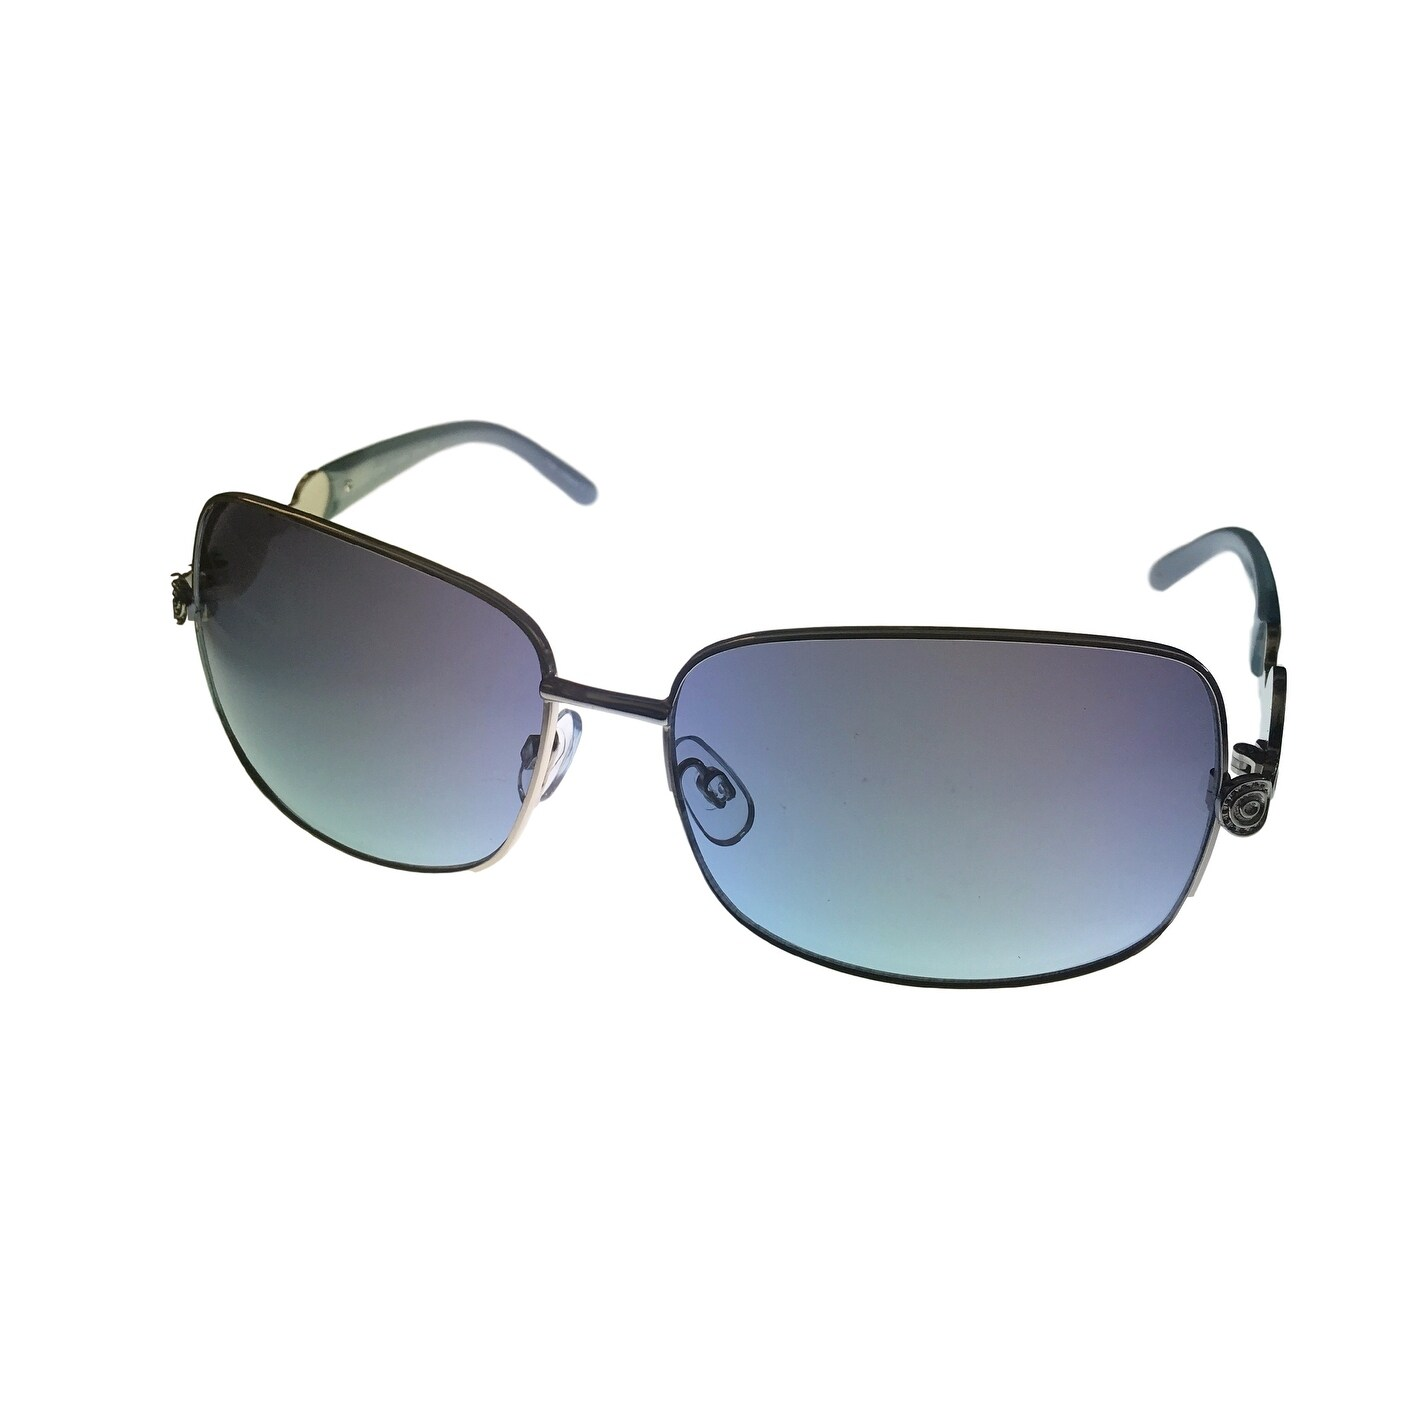 Esprit Womens Sunglass 19324 543 Silver Blue Aviator, Smoke Gradient Lens - Medium - Thumbnail 0